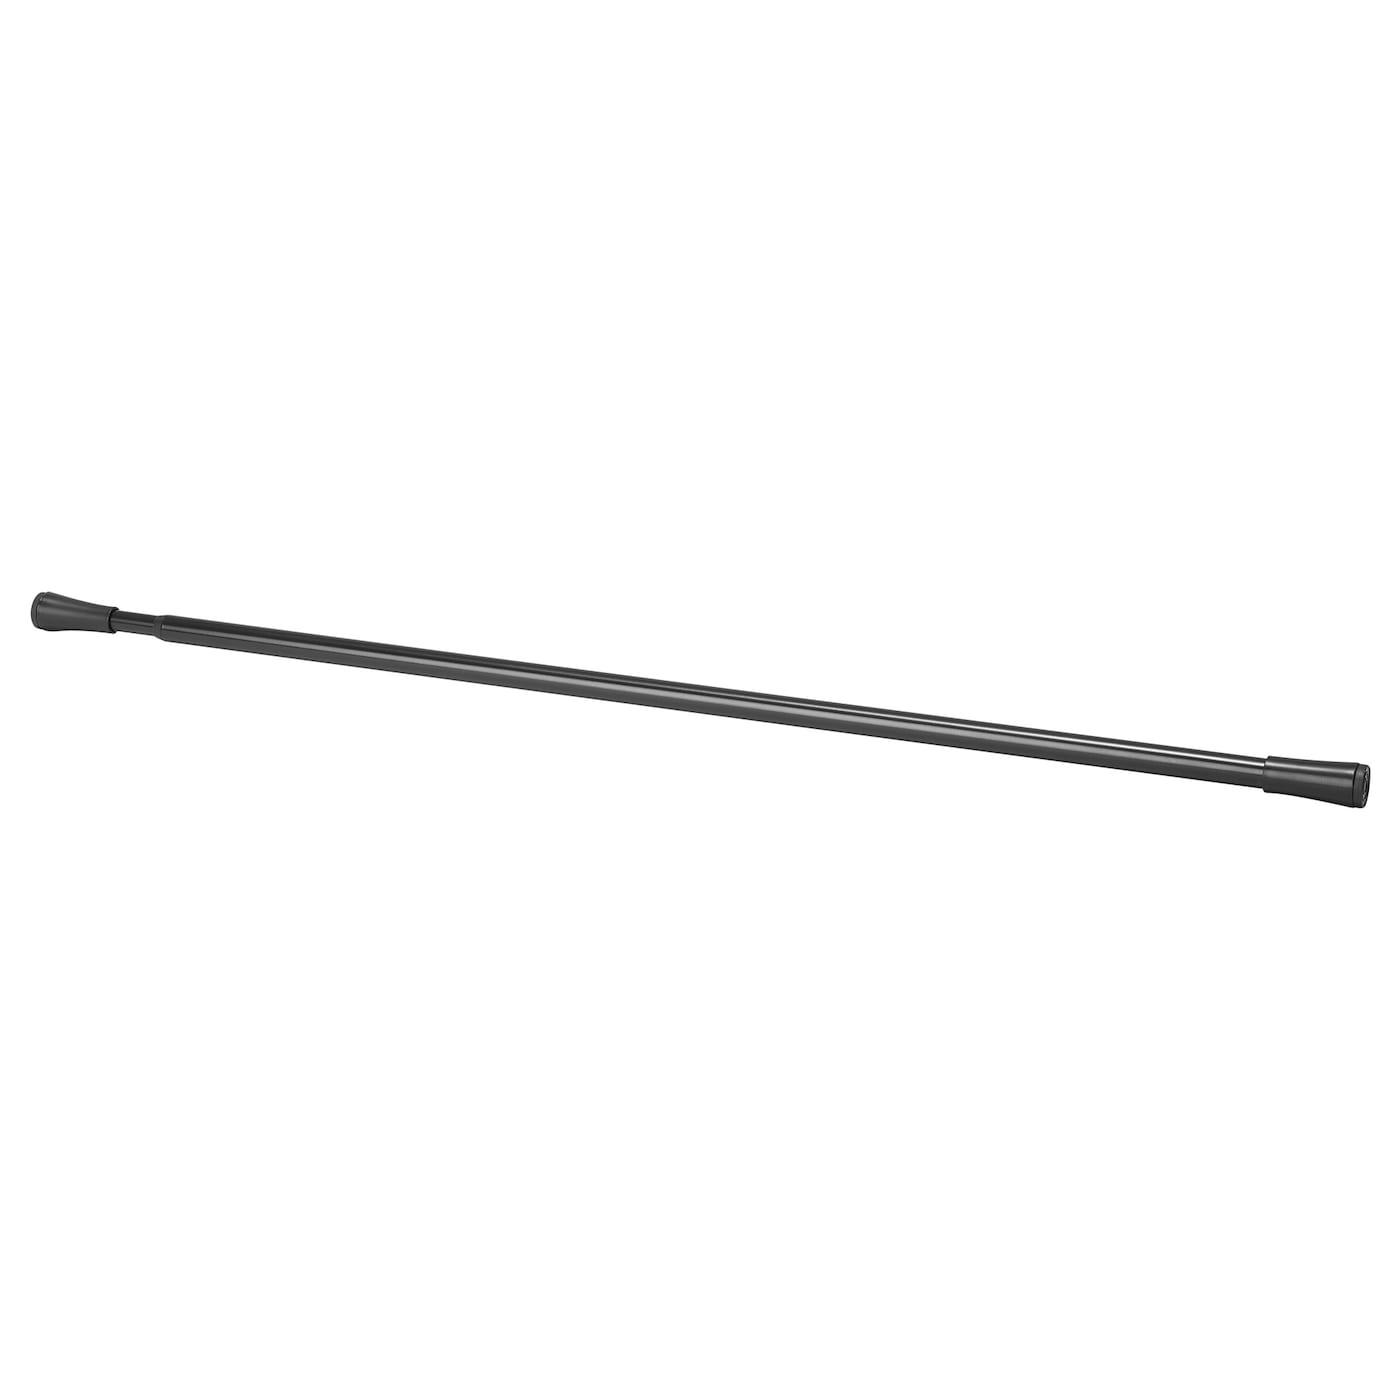 FjÄdrande Curtain Rod Black 27 ½ 47 ¼